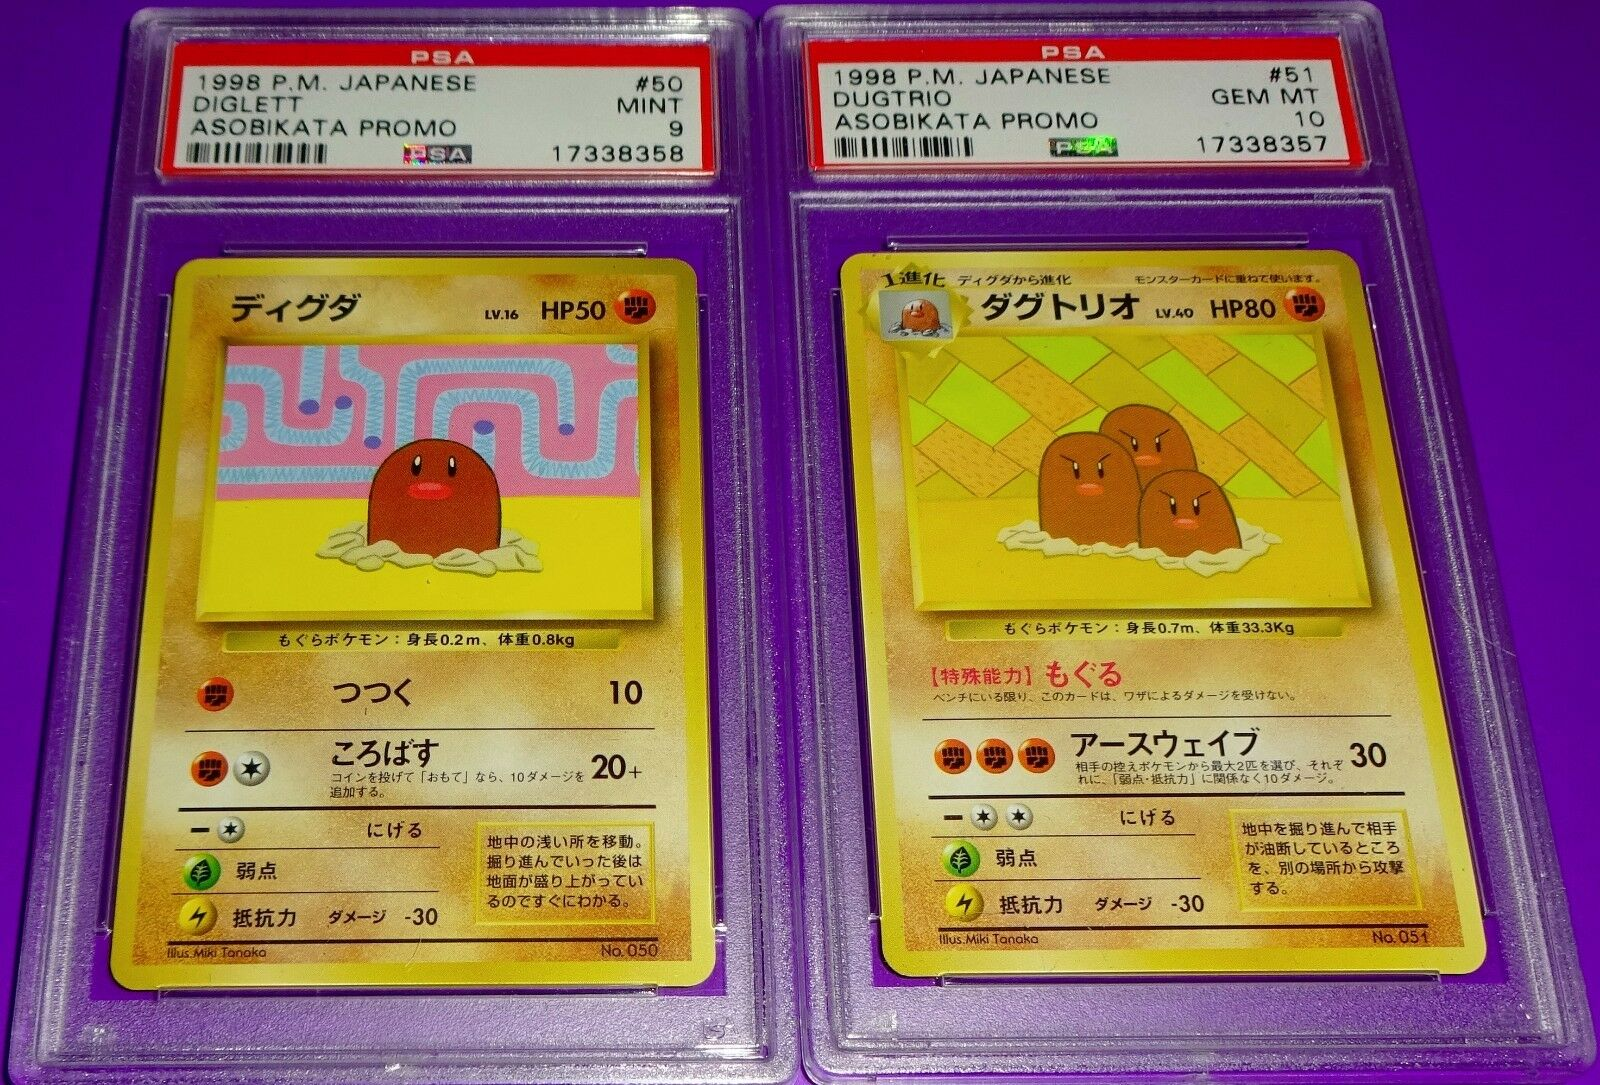 Pokemon Psa 9 Diglett Psa 10 Dugtrio Japanese Asobikata  promo 2 Card Lot